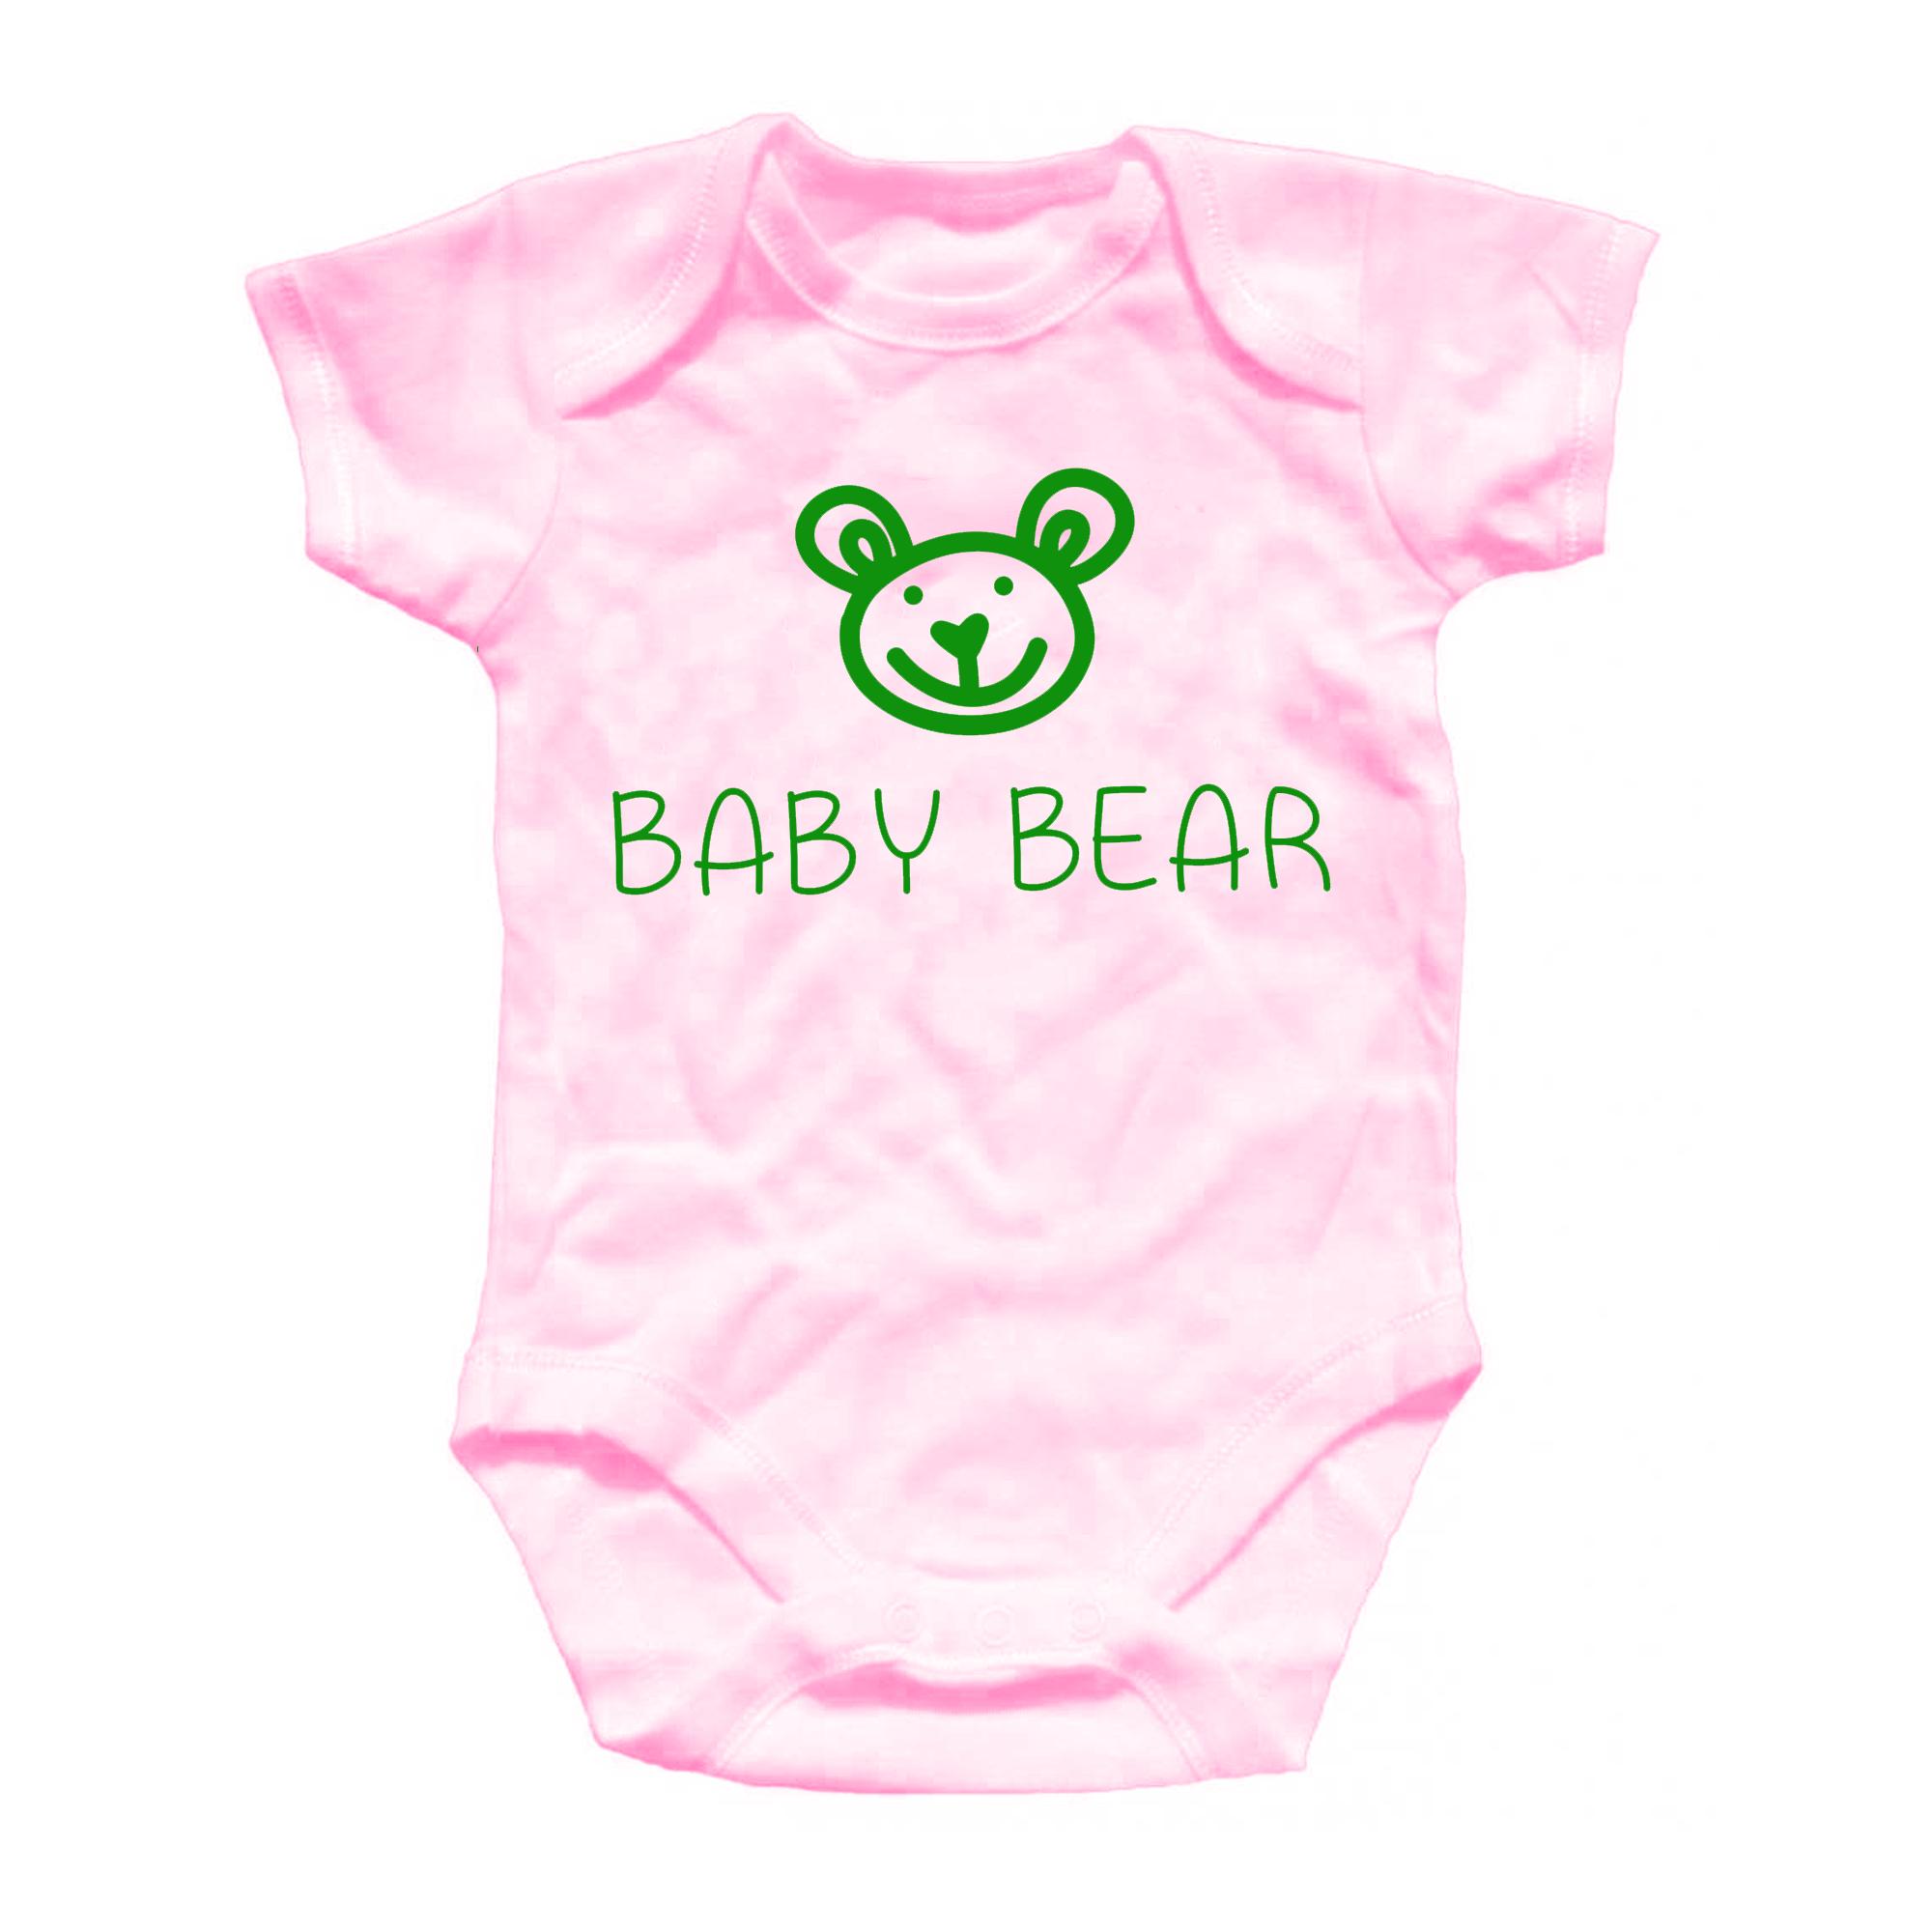 Personalised baby bear grow boys present gift onesie all in one blue personalised baby bear grow boys present gift onesie negle Gallery